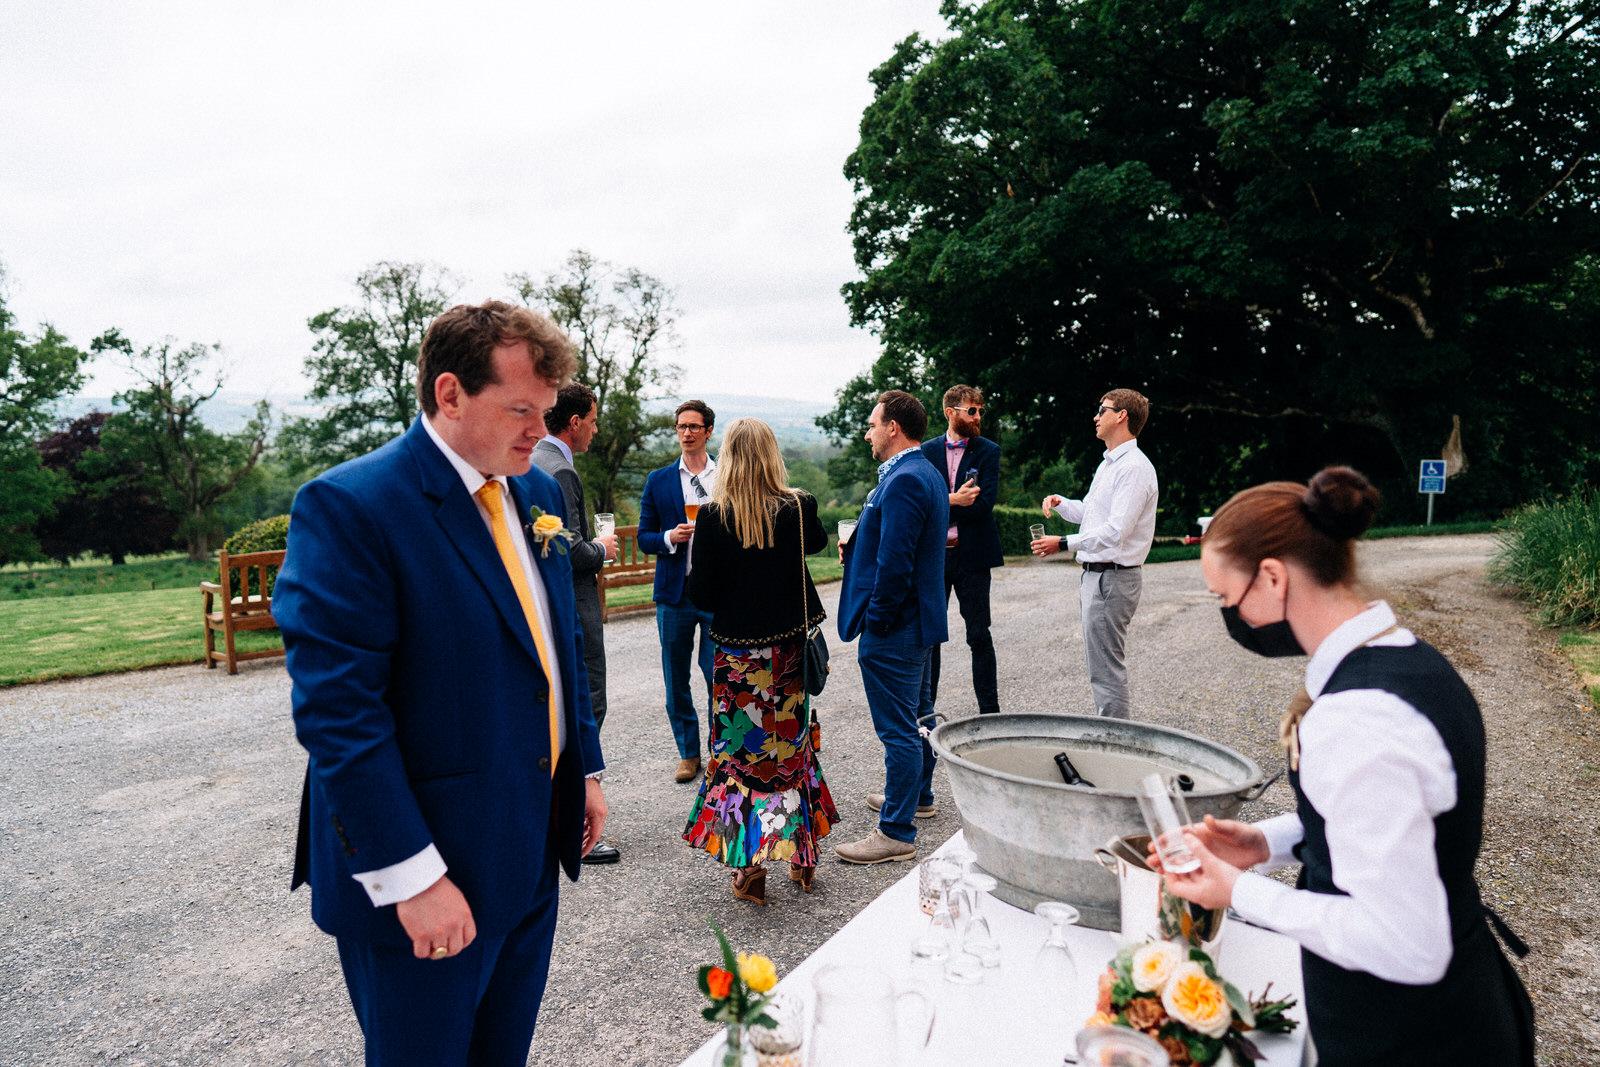 Cork documentary wedding photography 0126 125